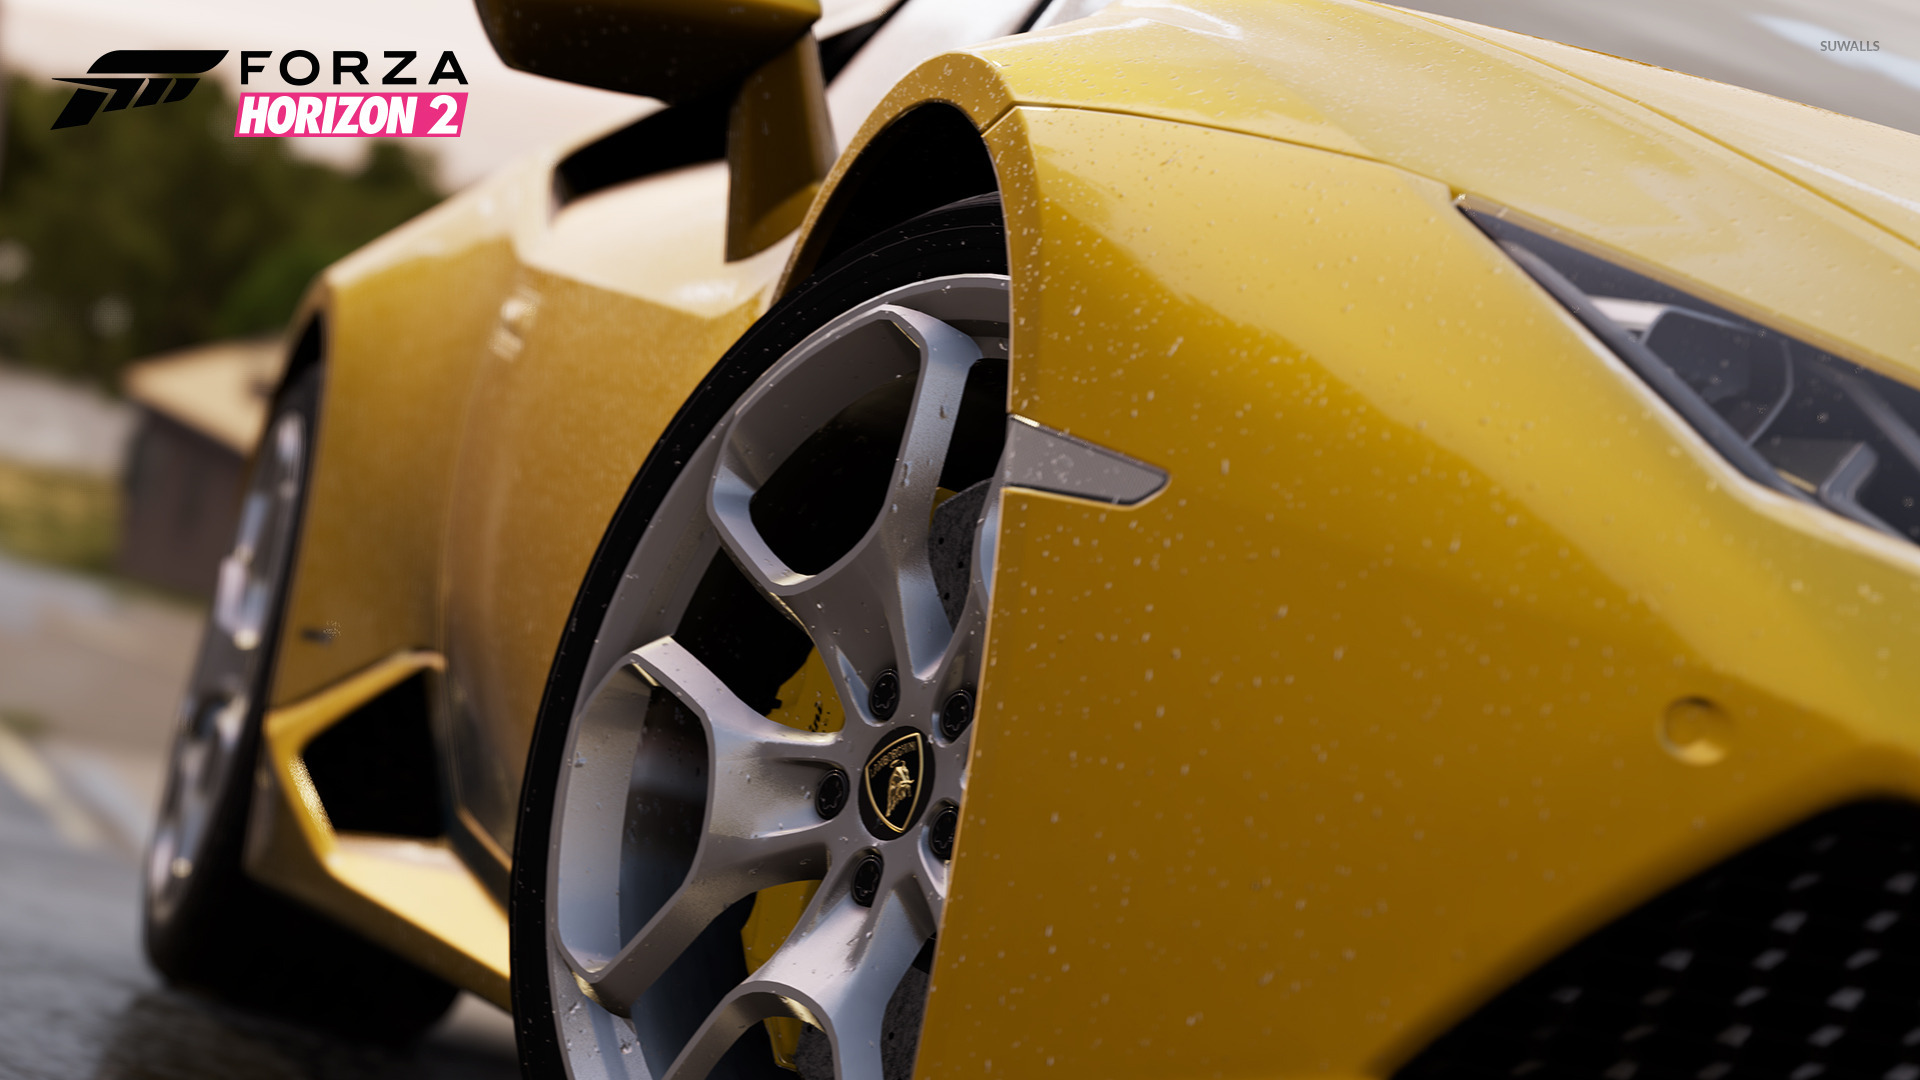 lamborghini-huracan-lp-610-4-forza-horizon-2-31001-1920x1080 Elegant Lamborghini Huracan forza Horizon 2 Cars Trend